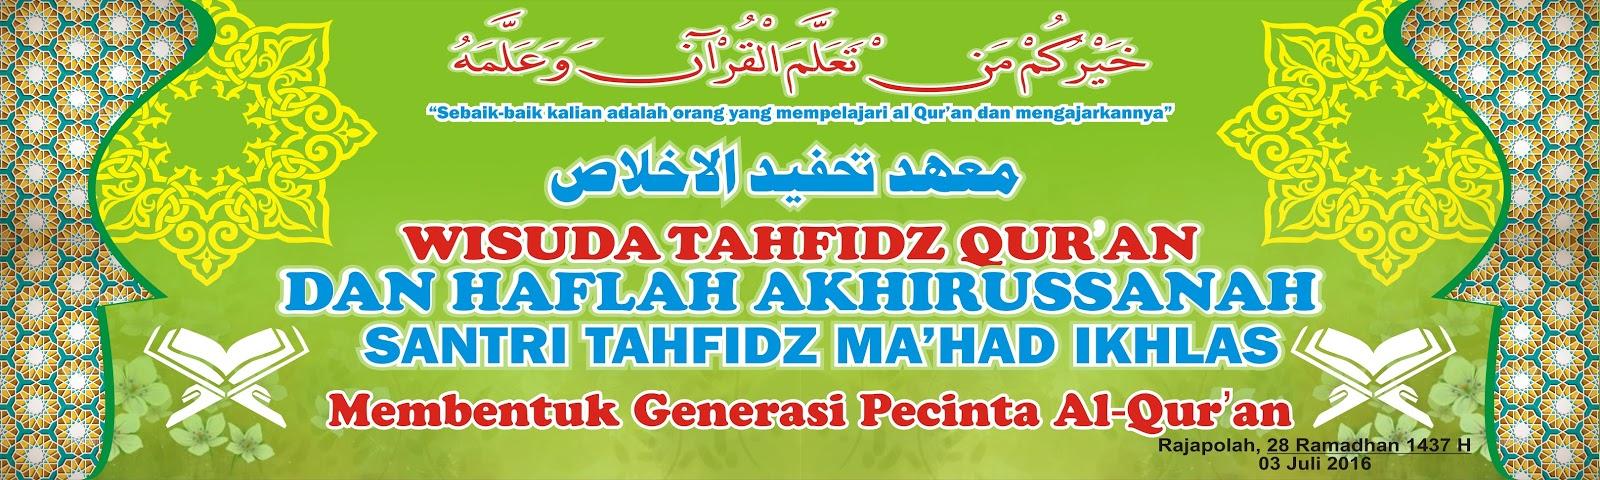 Background Banner Haflah